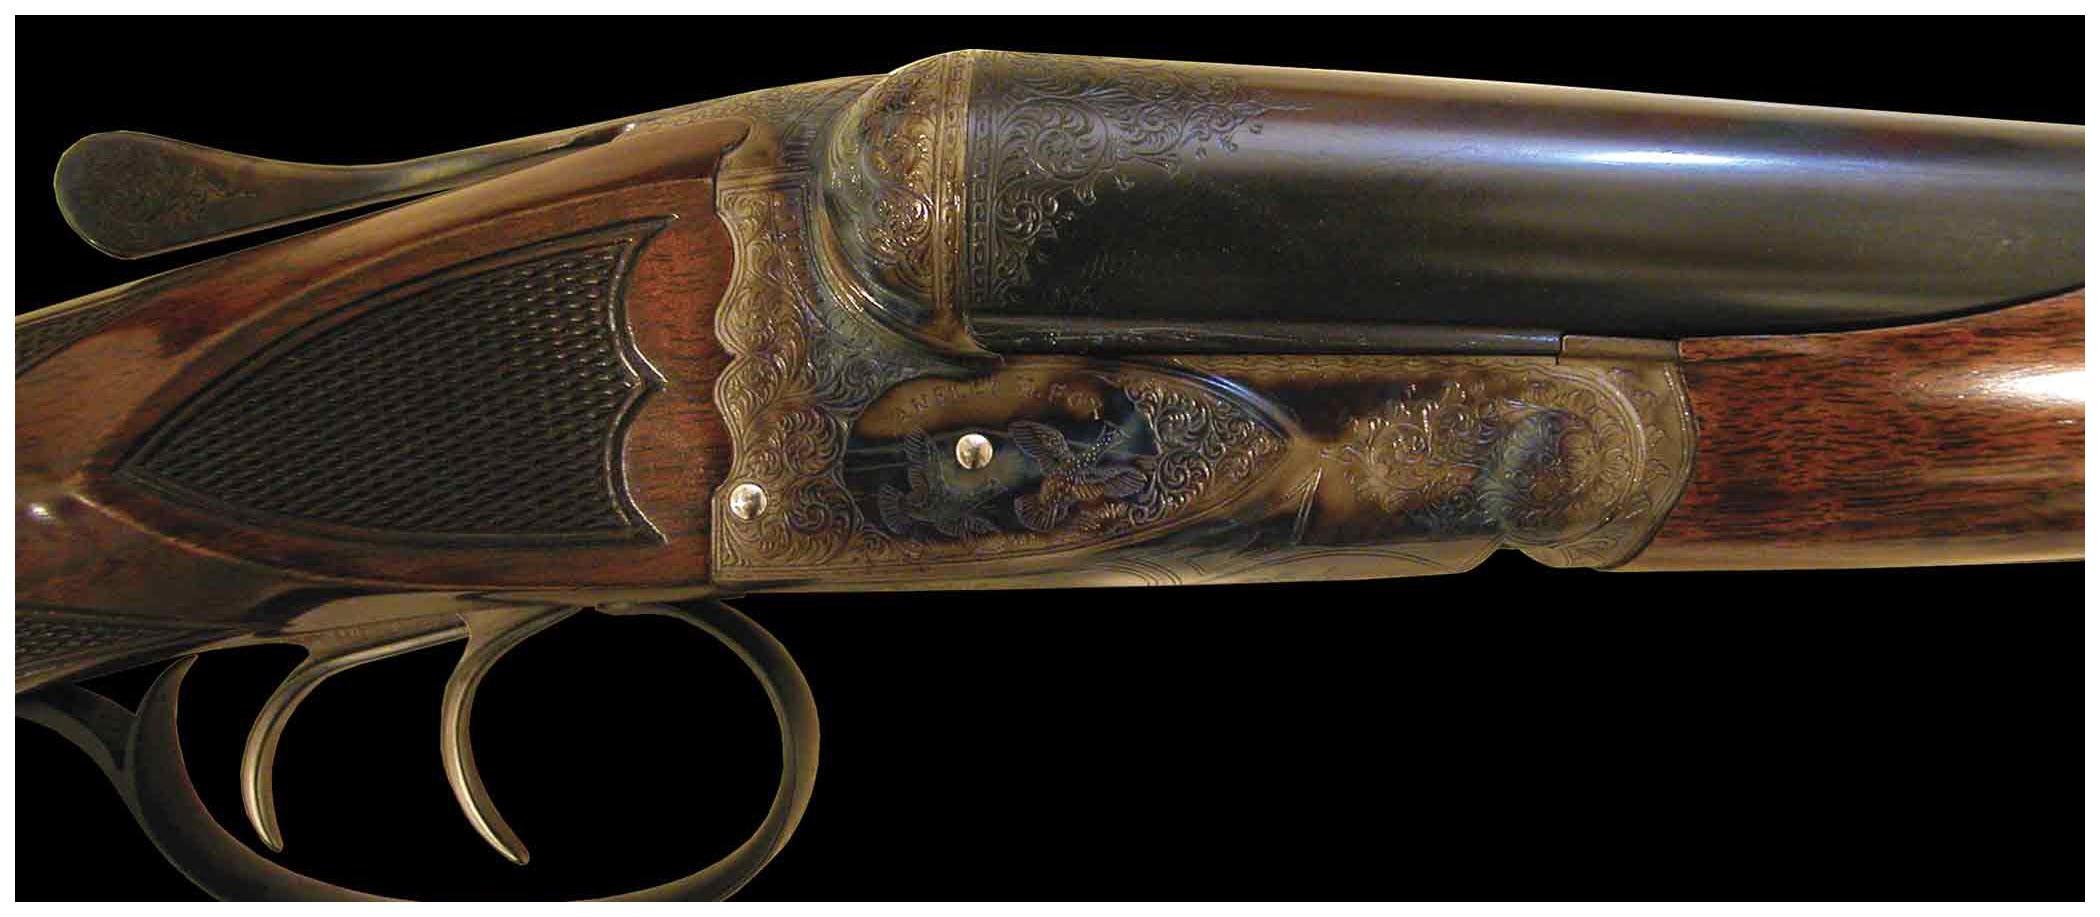 HD Quality Wallpaper | Collection: Weapons, 2100x917 Baserri Shotgun